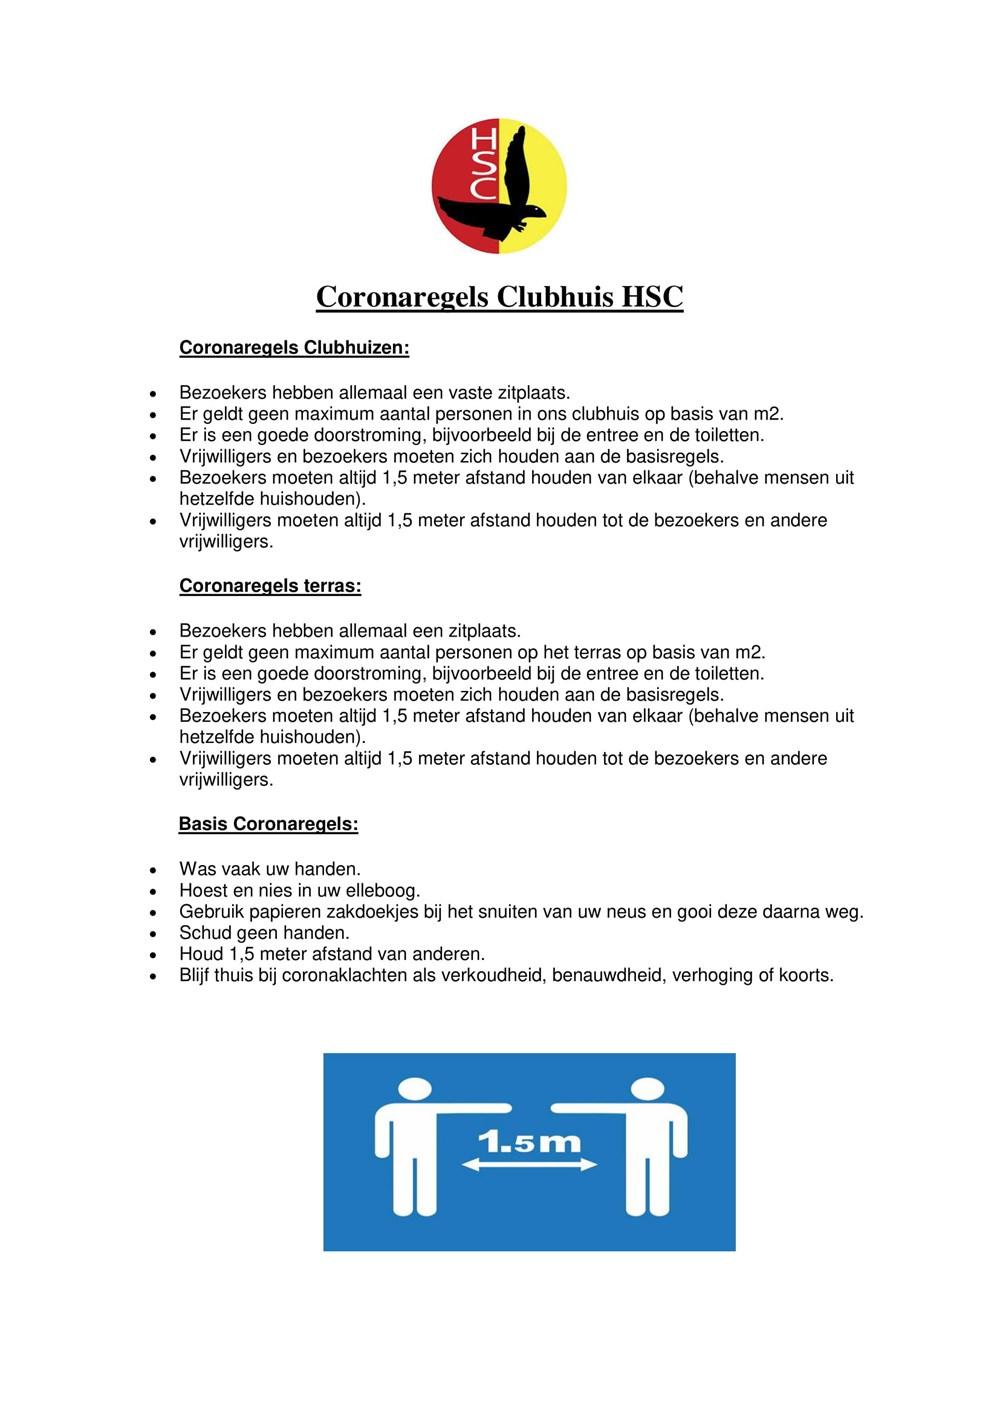 Coronaregels_Clubhuis_HSC-1.jpg